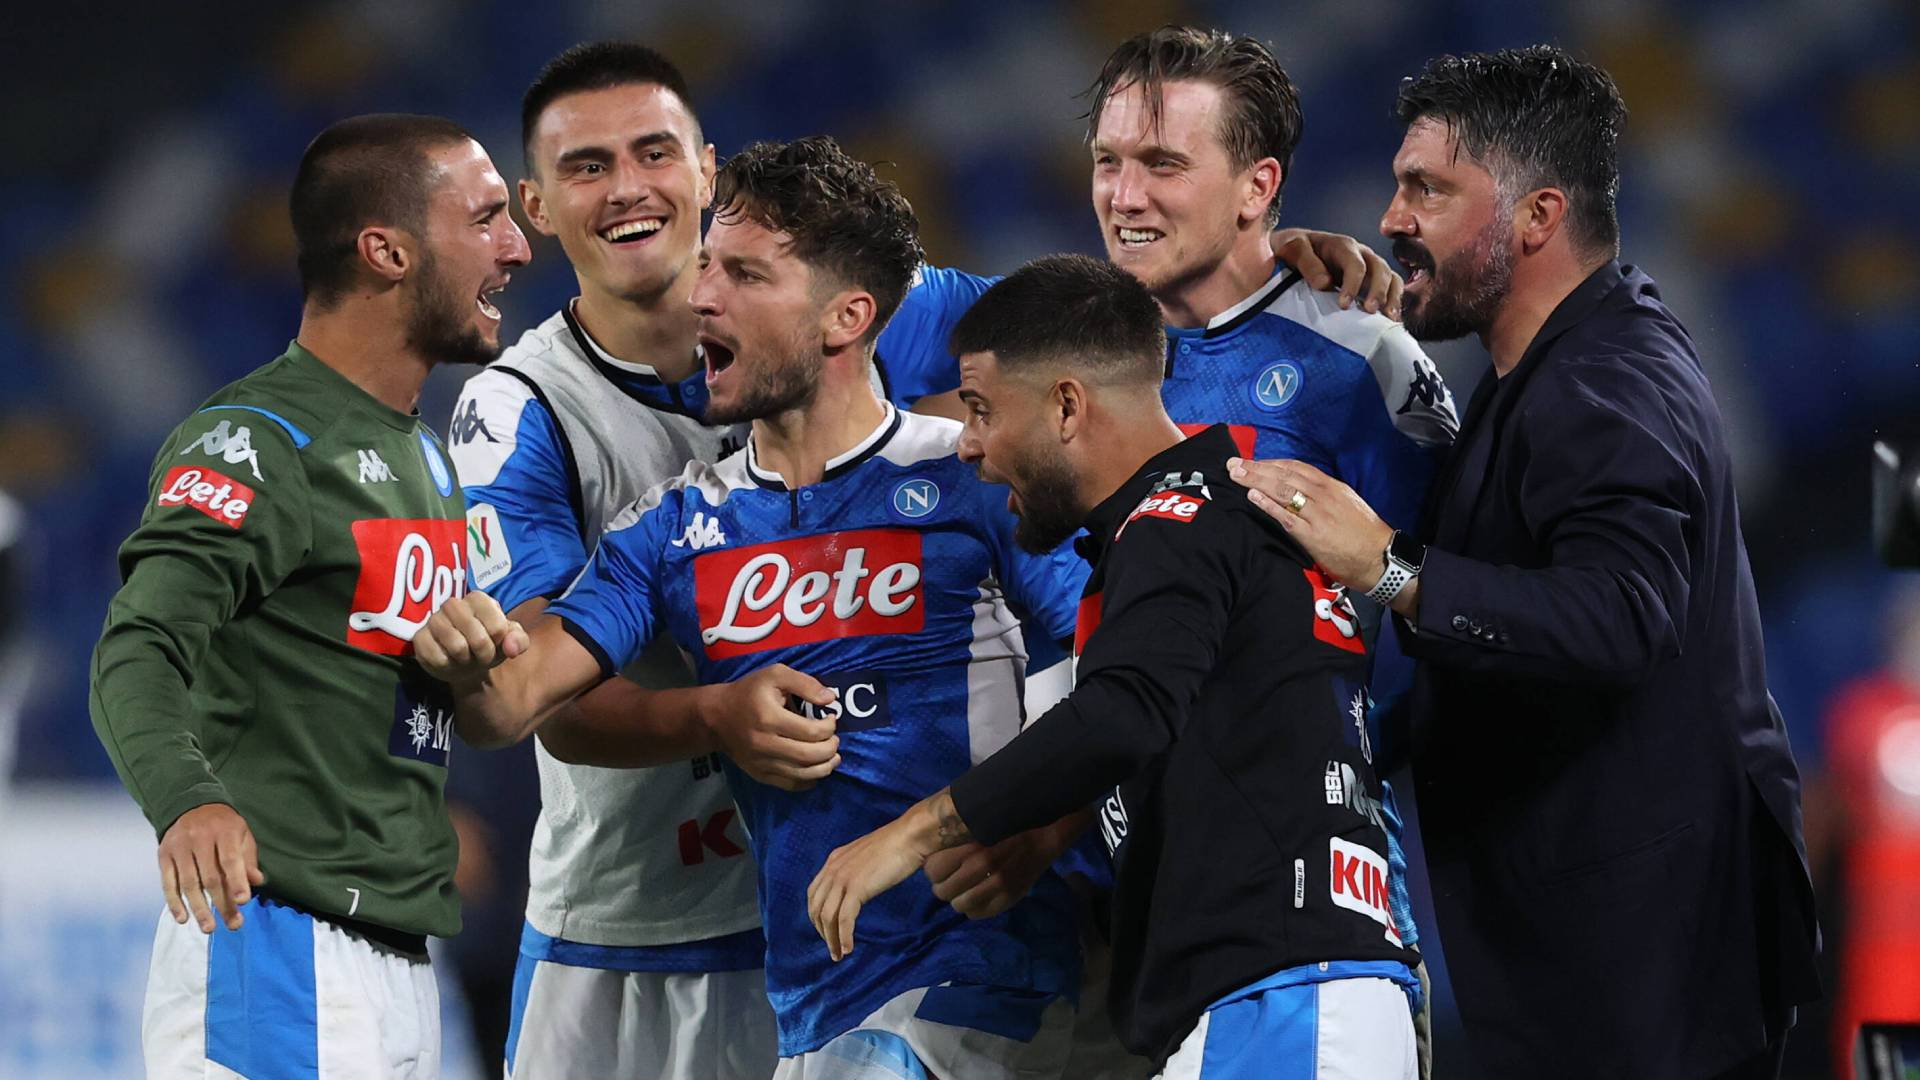 Uventus Turin Vs Napoli Heute Live Im TV Und Livestream